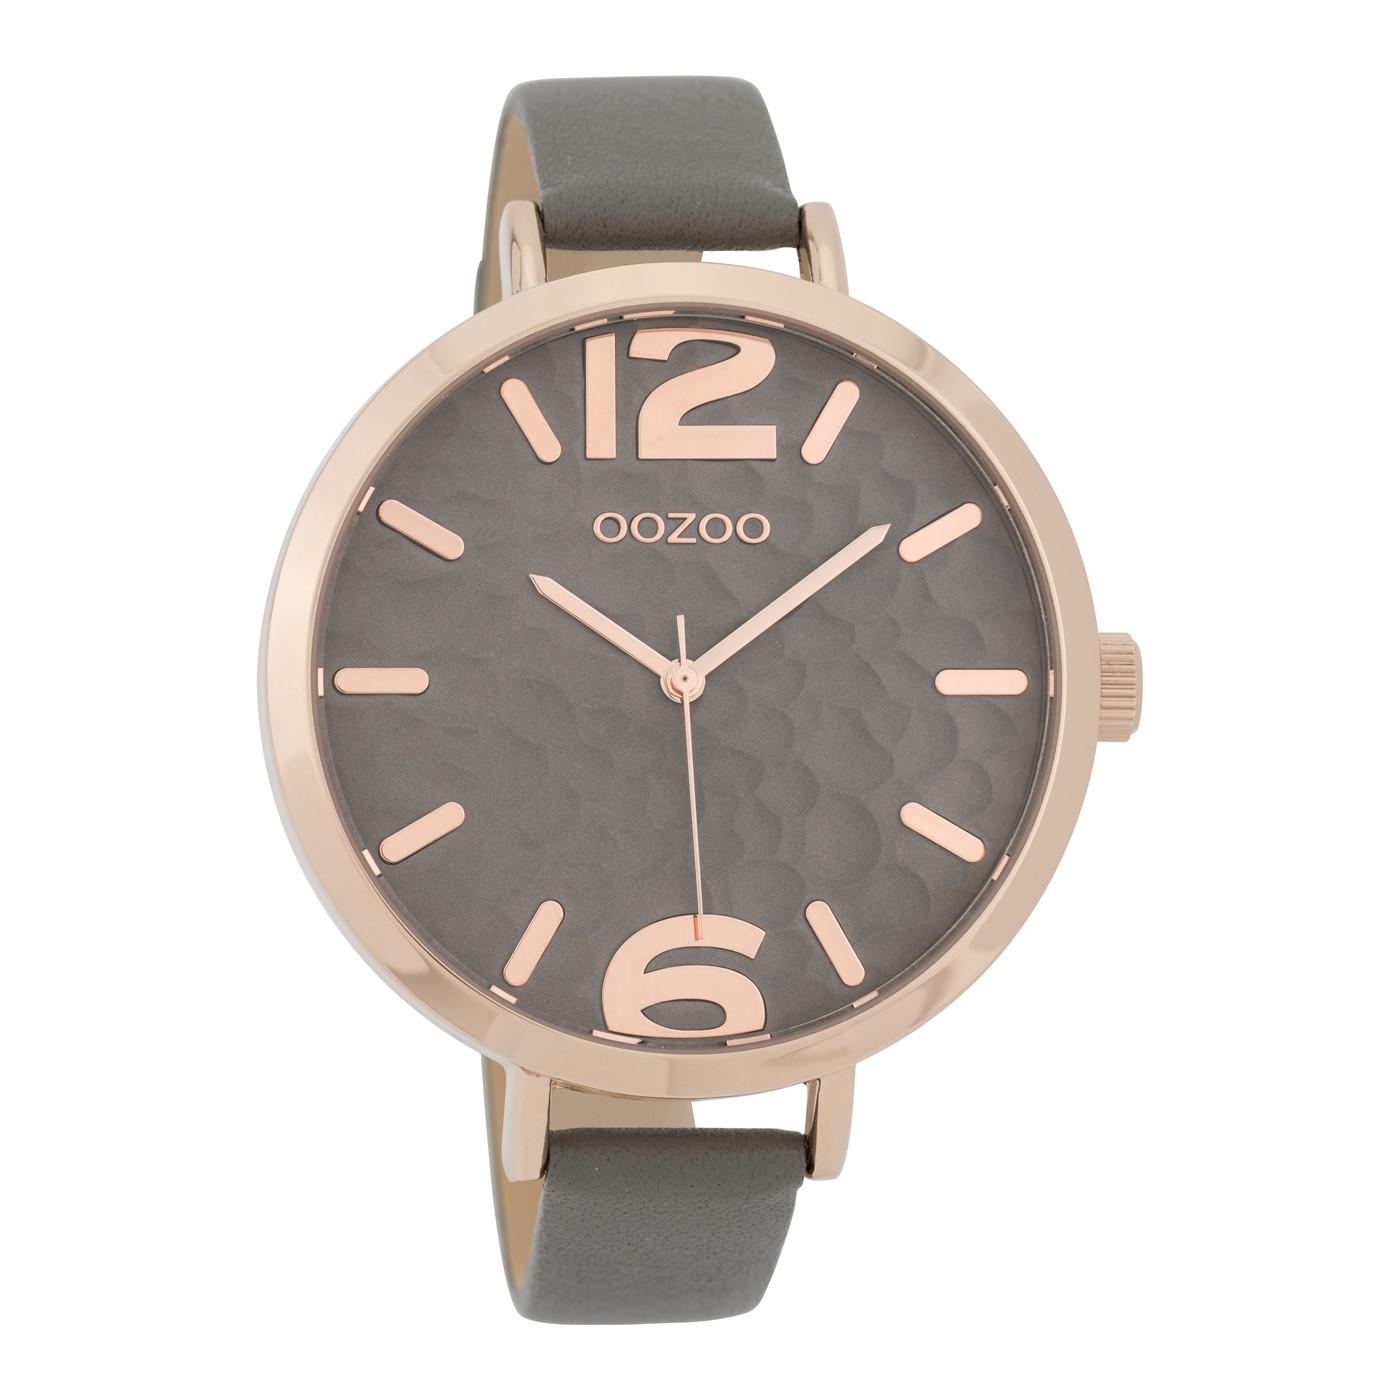 OOZOO Horloge Timepieces Collection staal/leder rosekleurige-olifantgrijs C9713